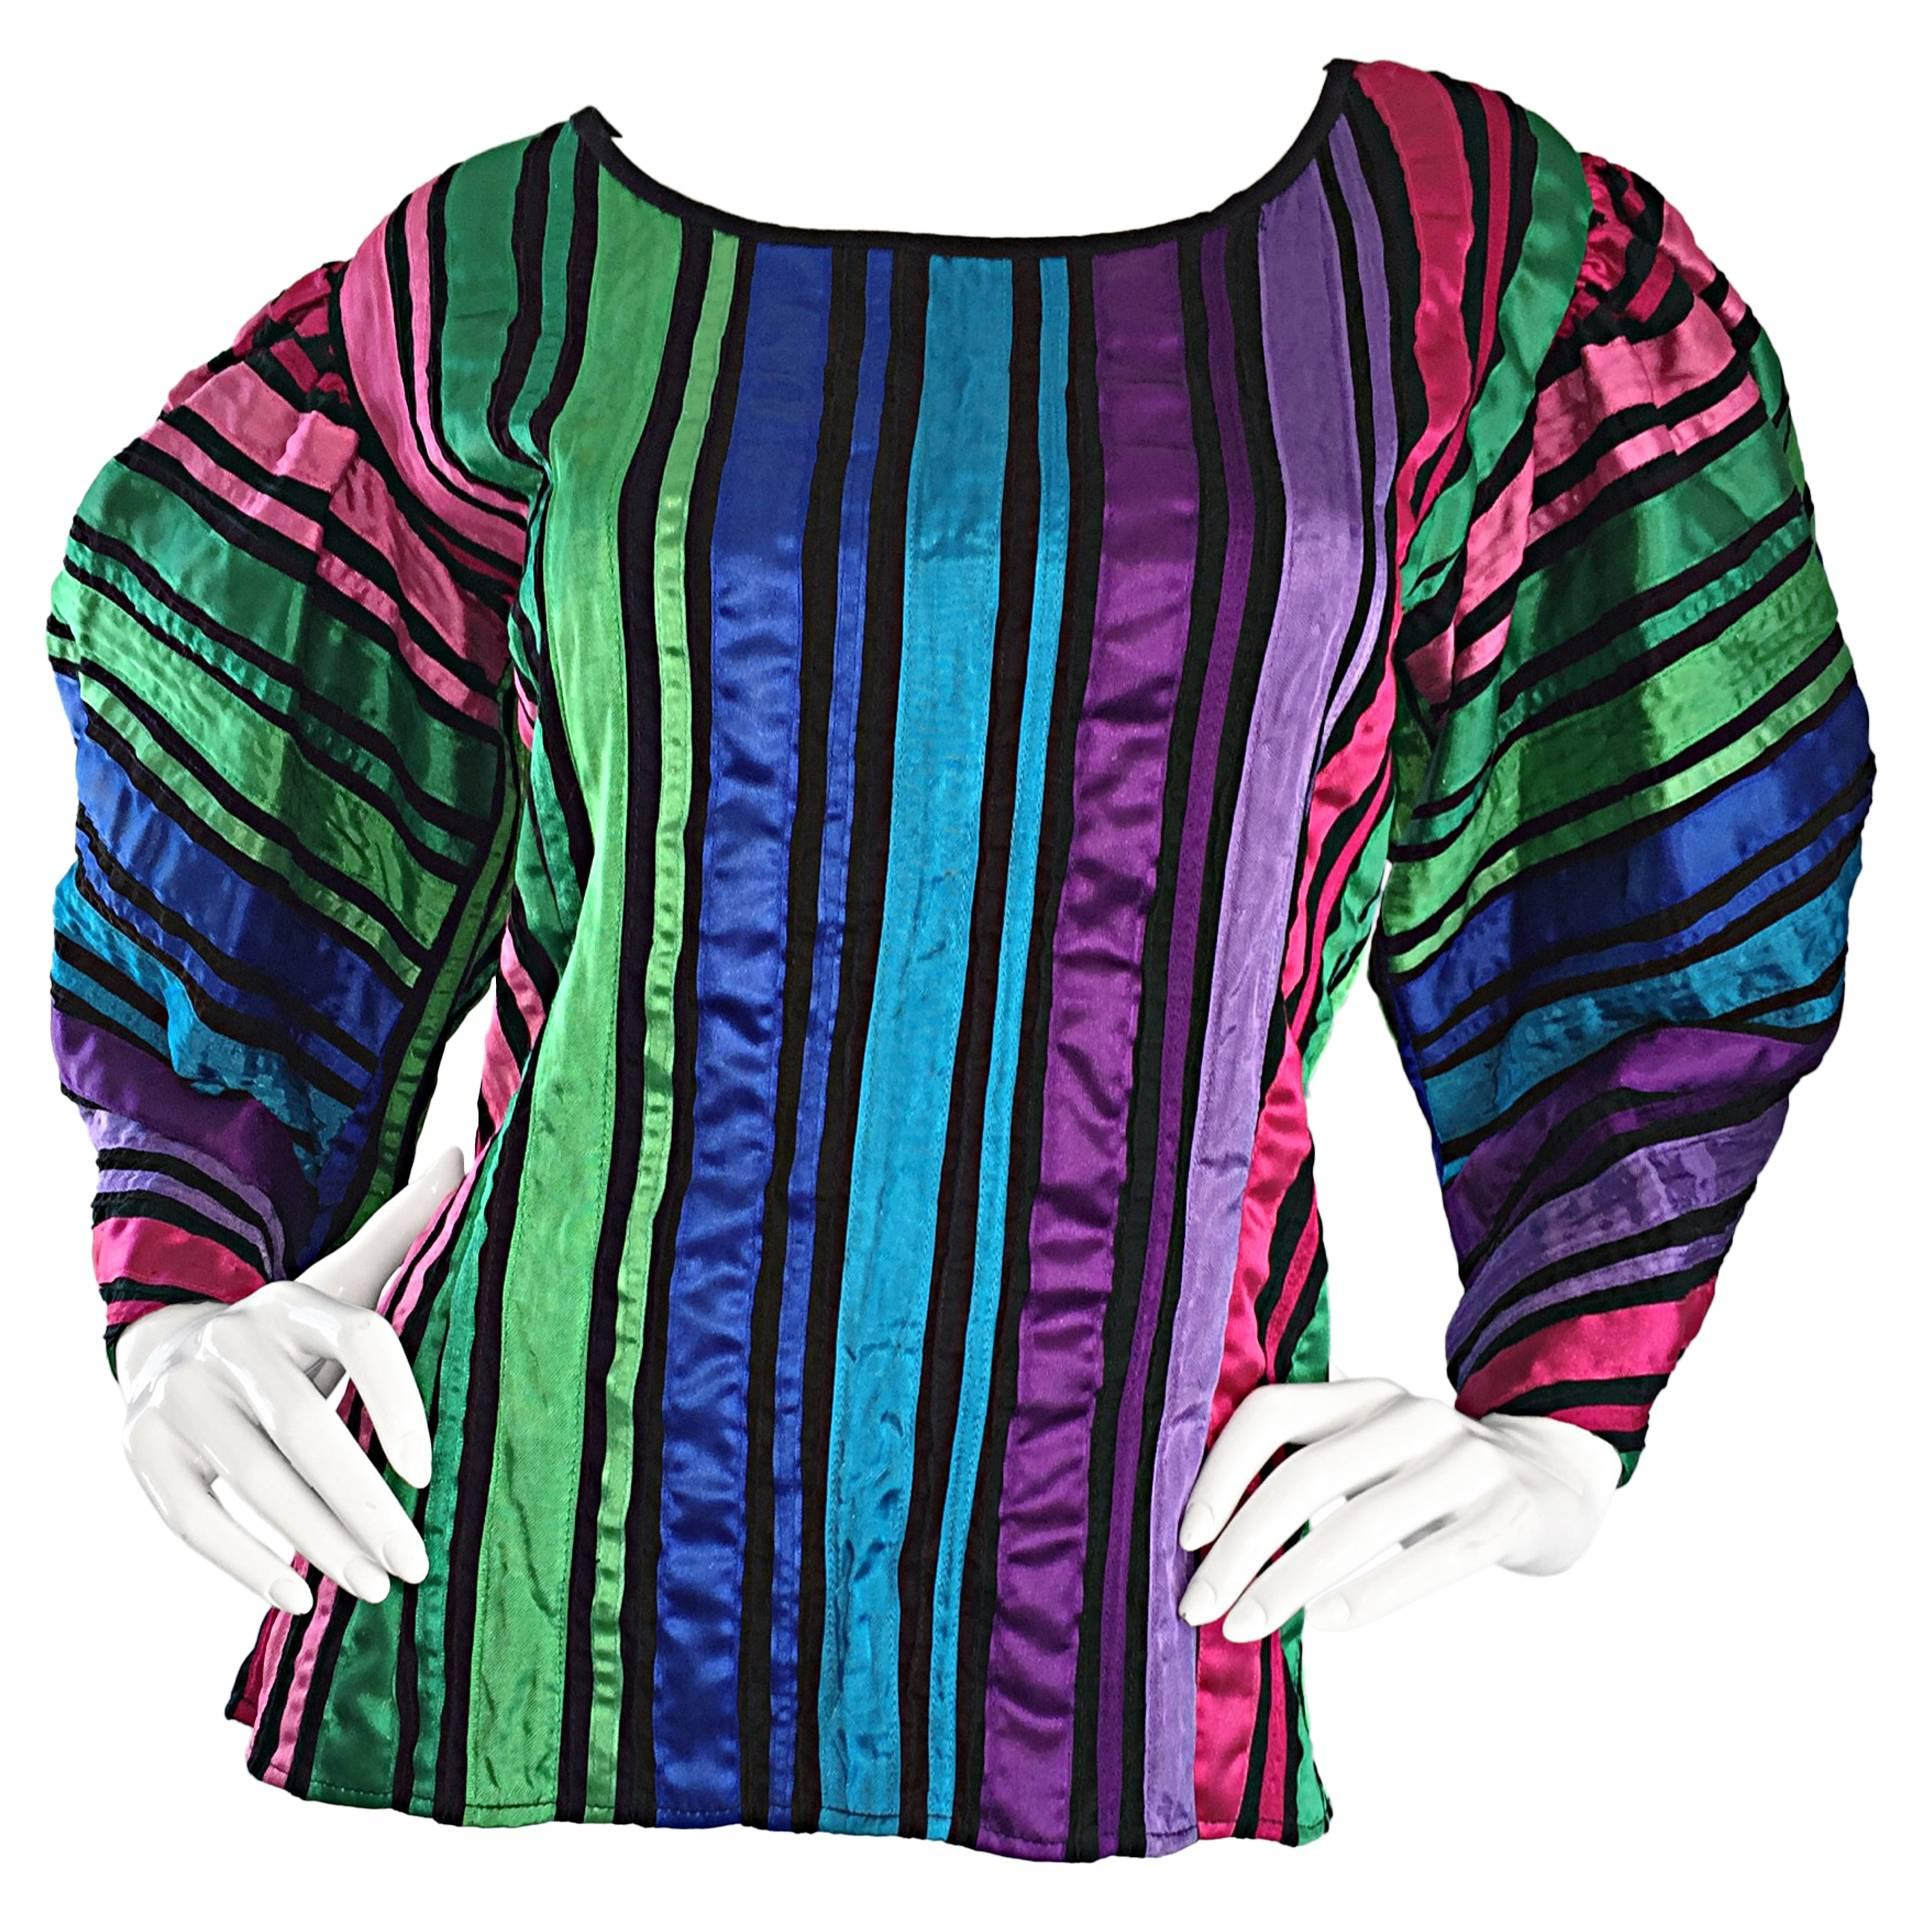 Tachi Castillo Vintage Mexican Colorful Rainbow Striped Cotton Avant Garde Top